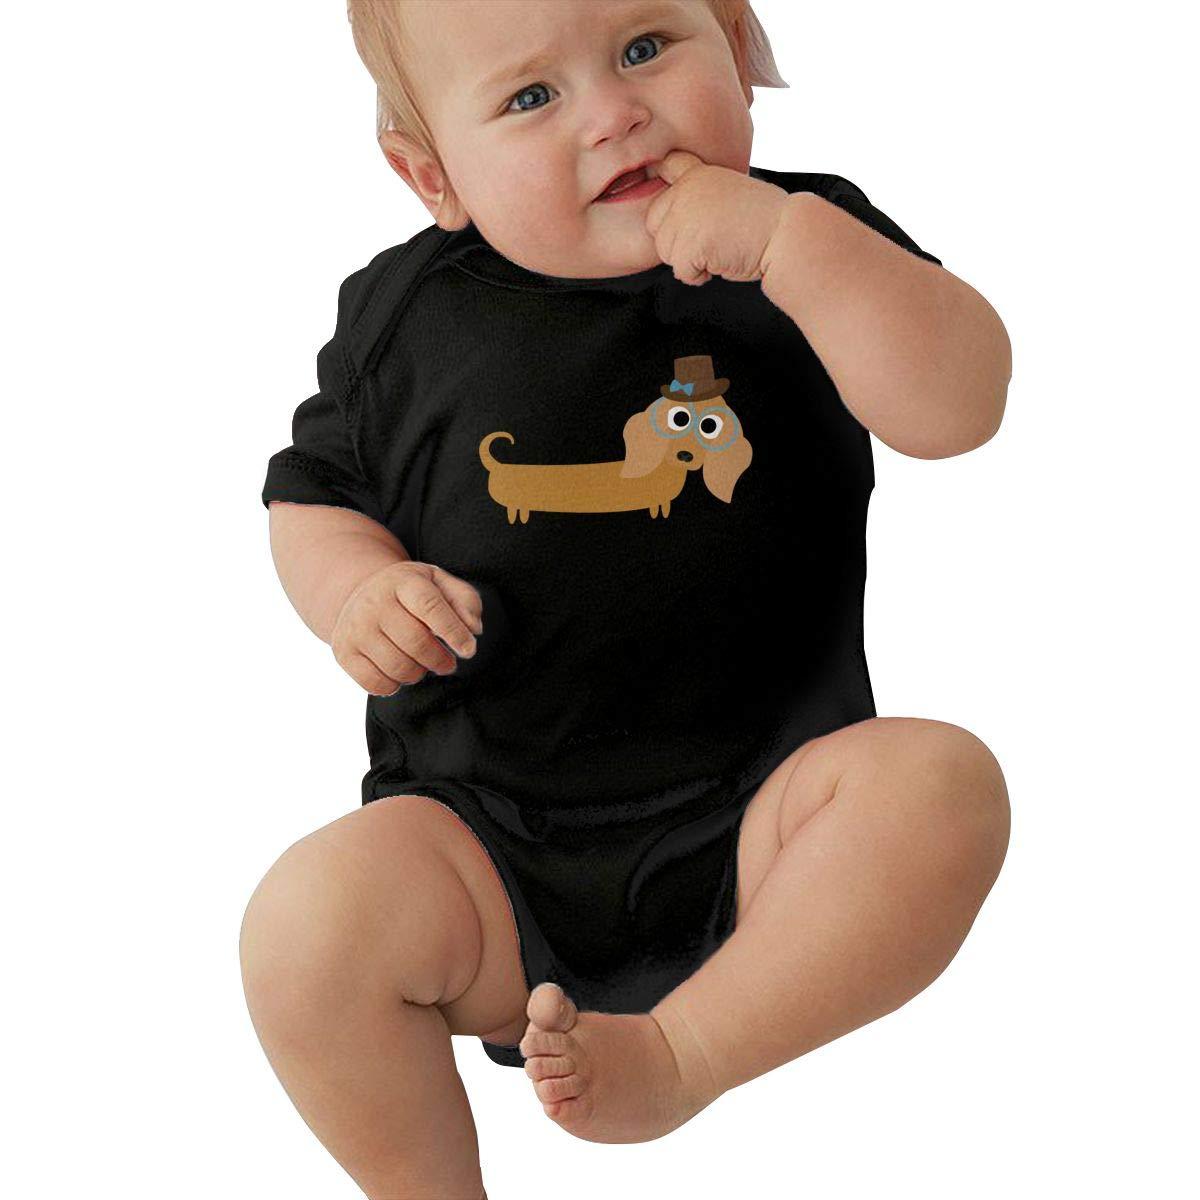 Dfenere Water Painting Graphic Newborn Baby Short Sleeve Bodysuit Romper Infant Summer Clothing